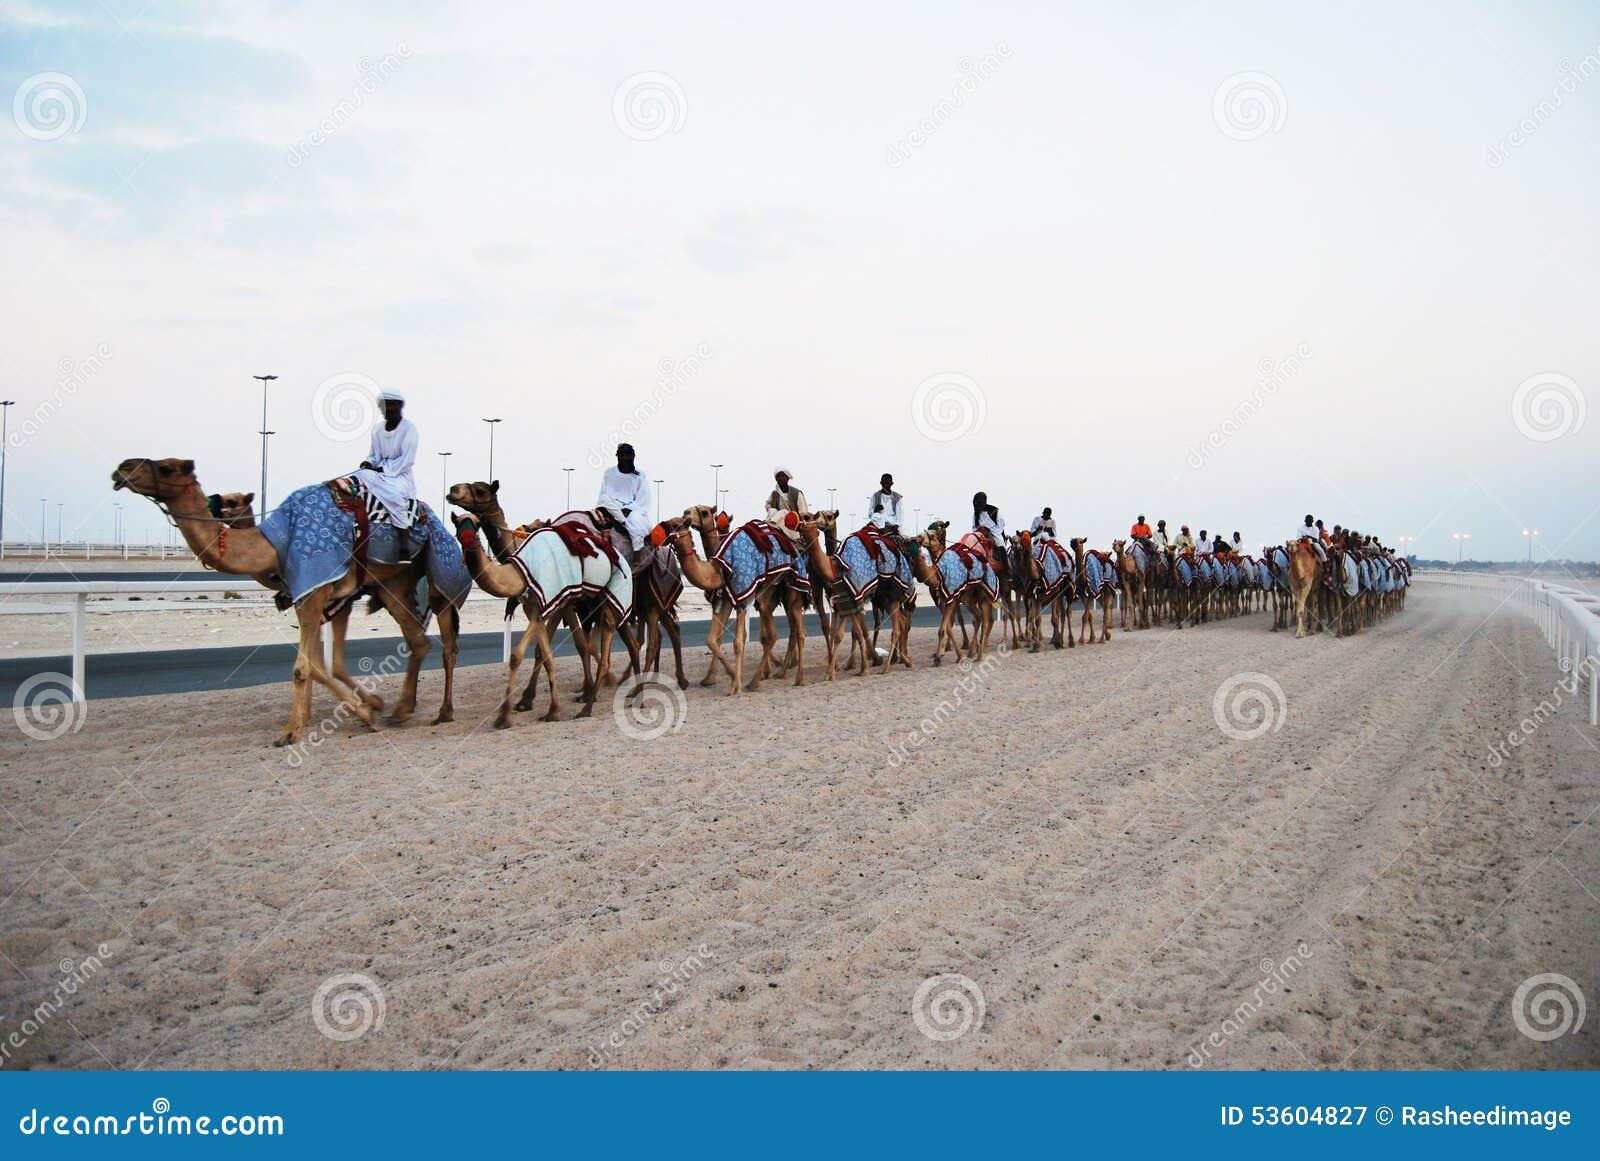 Course de chameau, Doha, Qatar